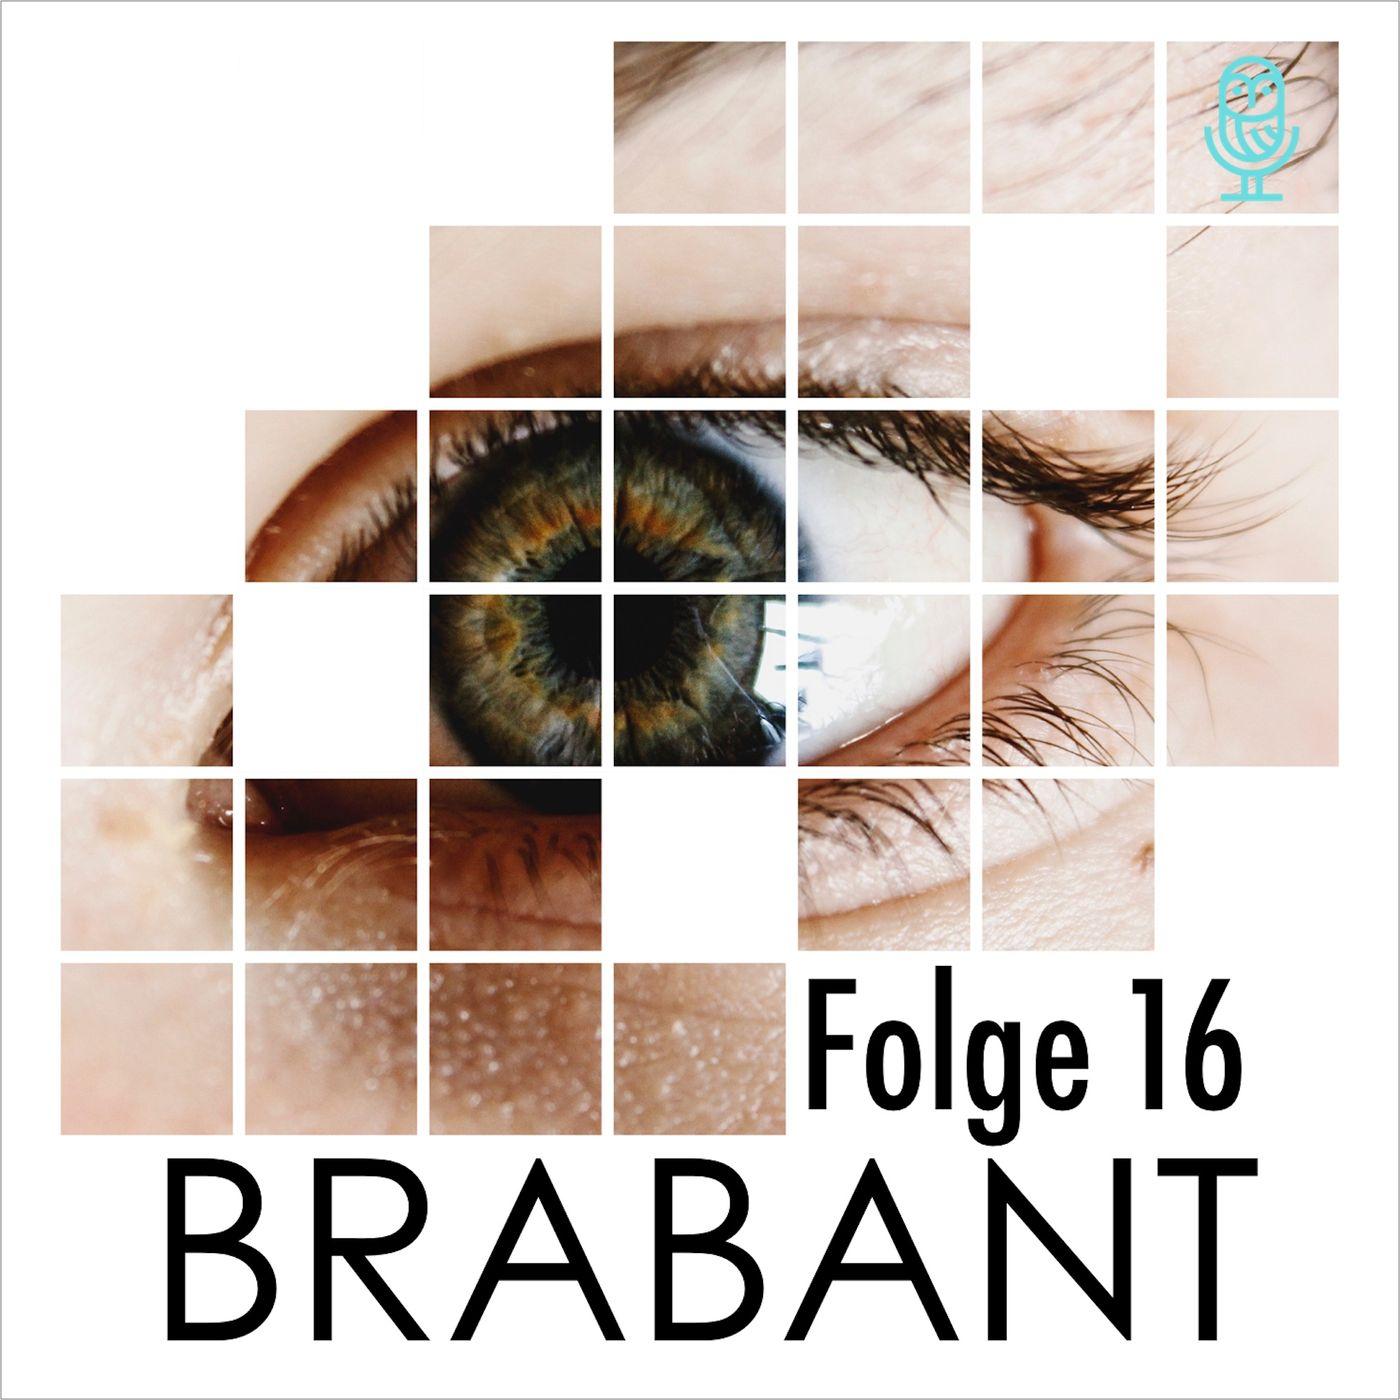 Folge 16: Die Brabant Mörder (6/6)